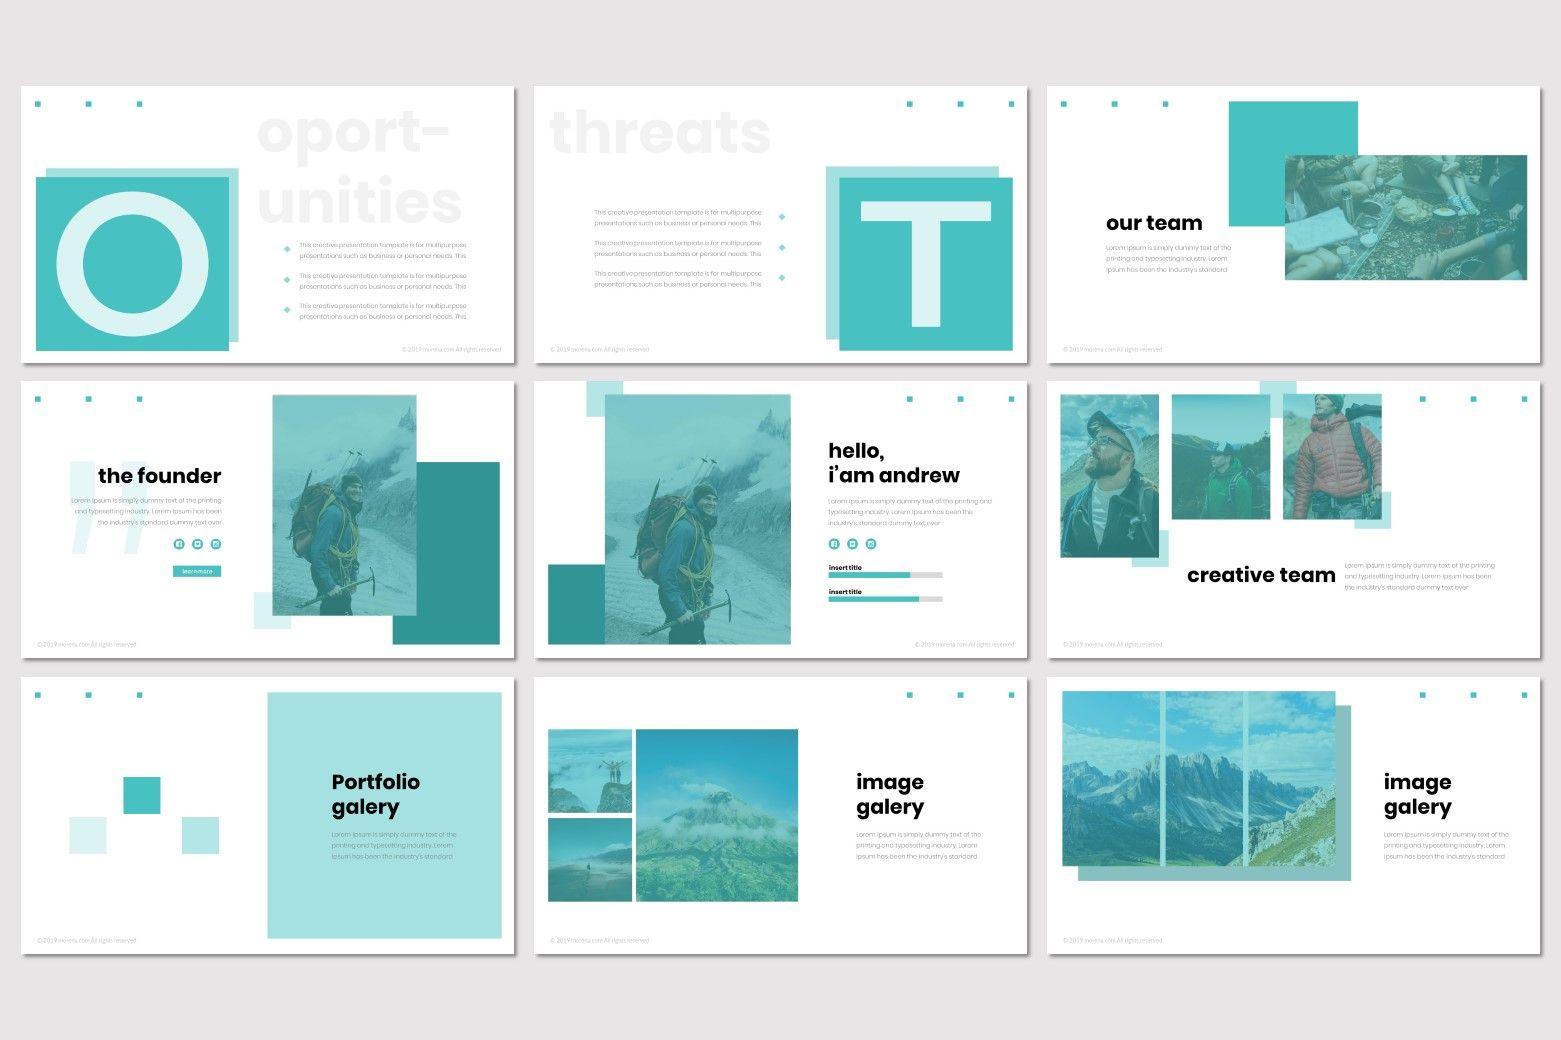 Moorena - PowerPoint Template, Slide 4, 07261, Presentation Templates — PoweredTemplate.com